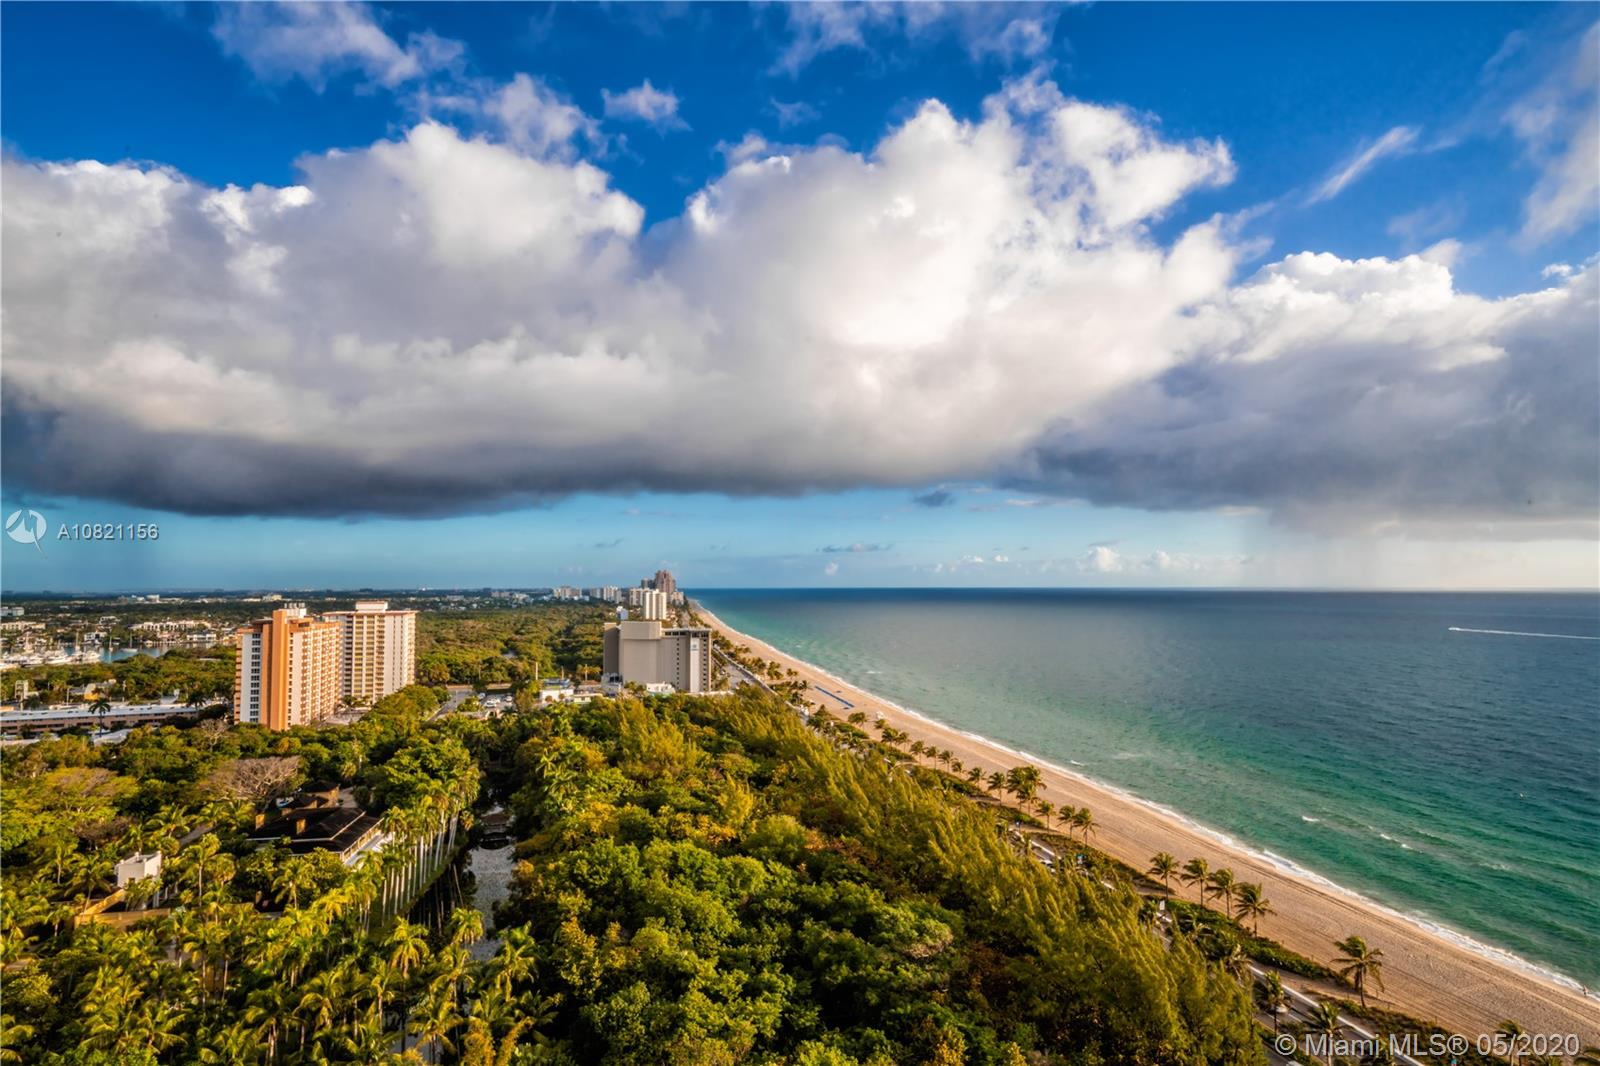 701 N Fort Lauderdale Beach Blvd Fort Lauderdale, FL